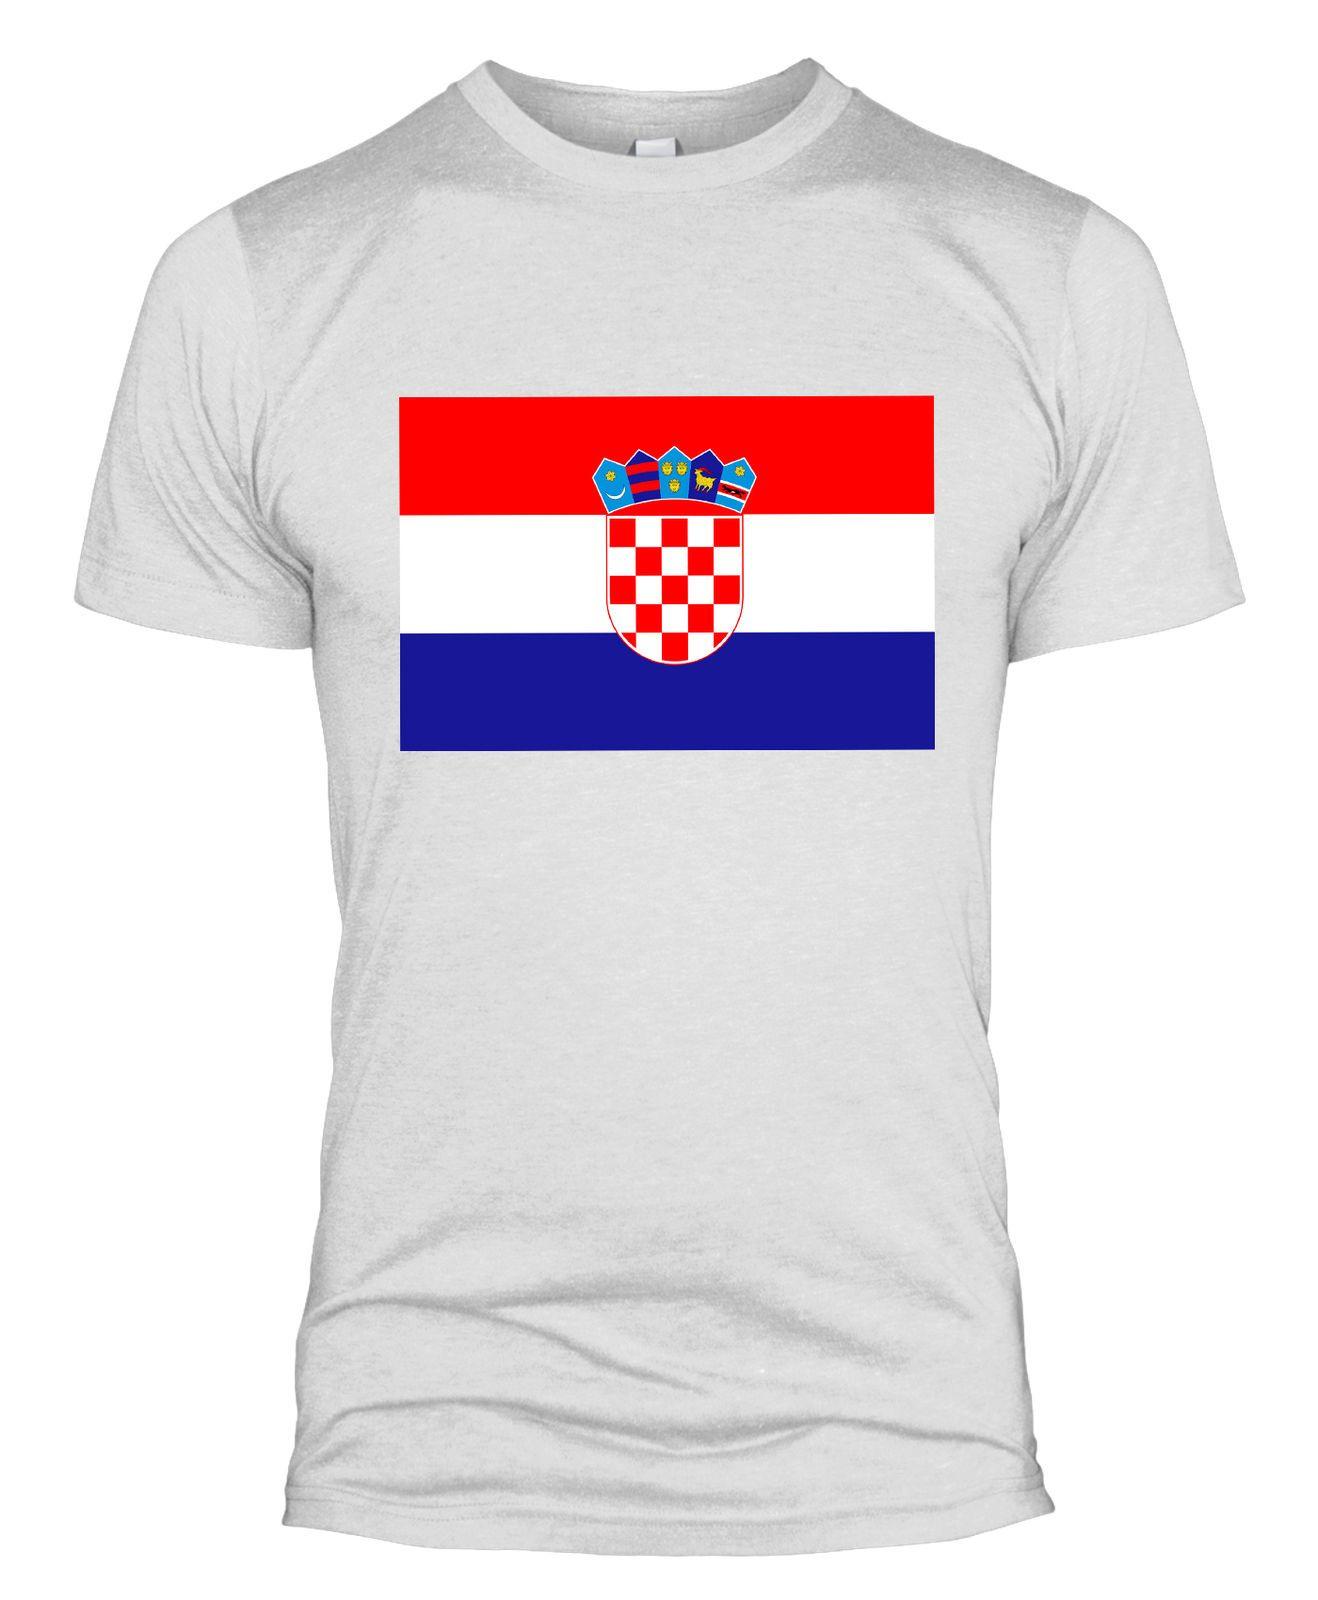 Croatia Flag T Shirt Football Support Croatian World Cup 2018 Men